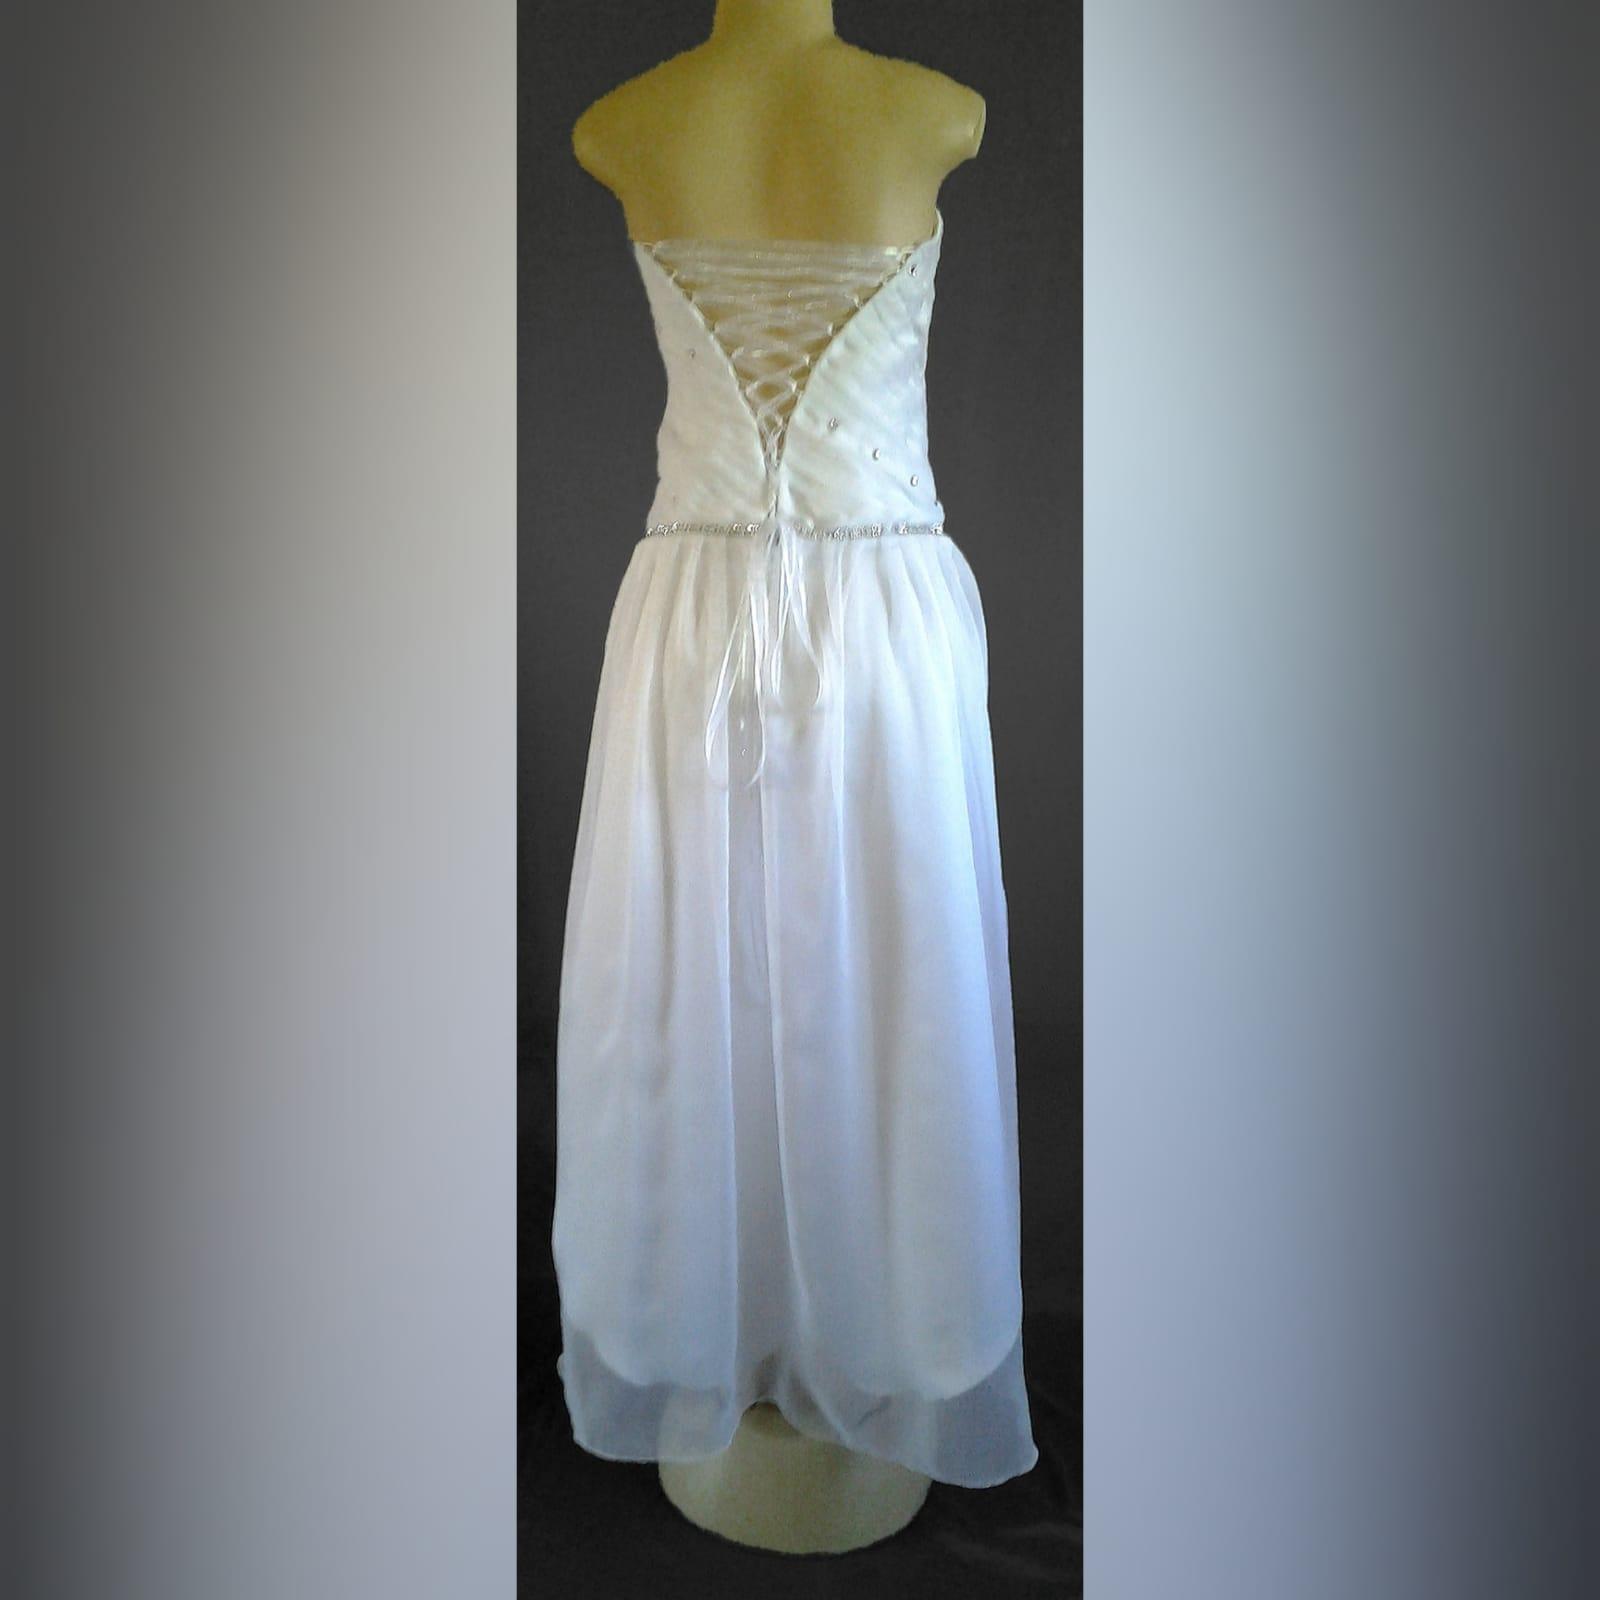 Hi-lo pleated bodice white wedding dress 2 hi-lo white chiffon wedding dress with a full pleated bodice. This wedding dress has a lace up back and silver finishes.